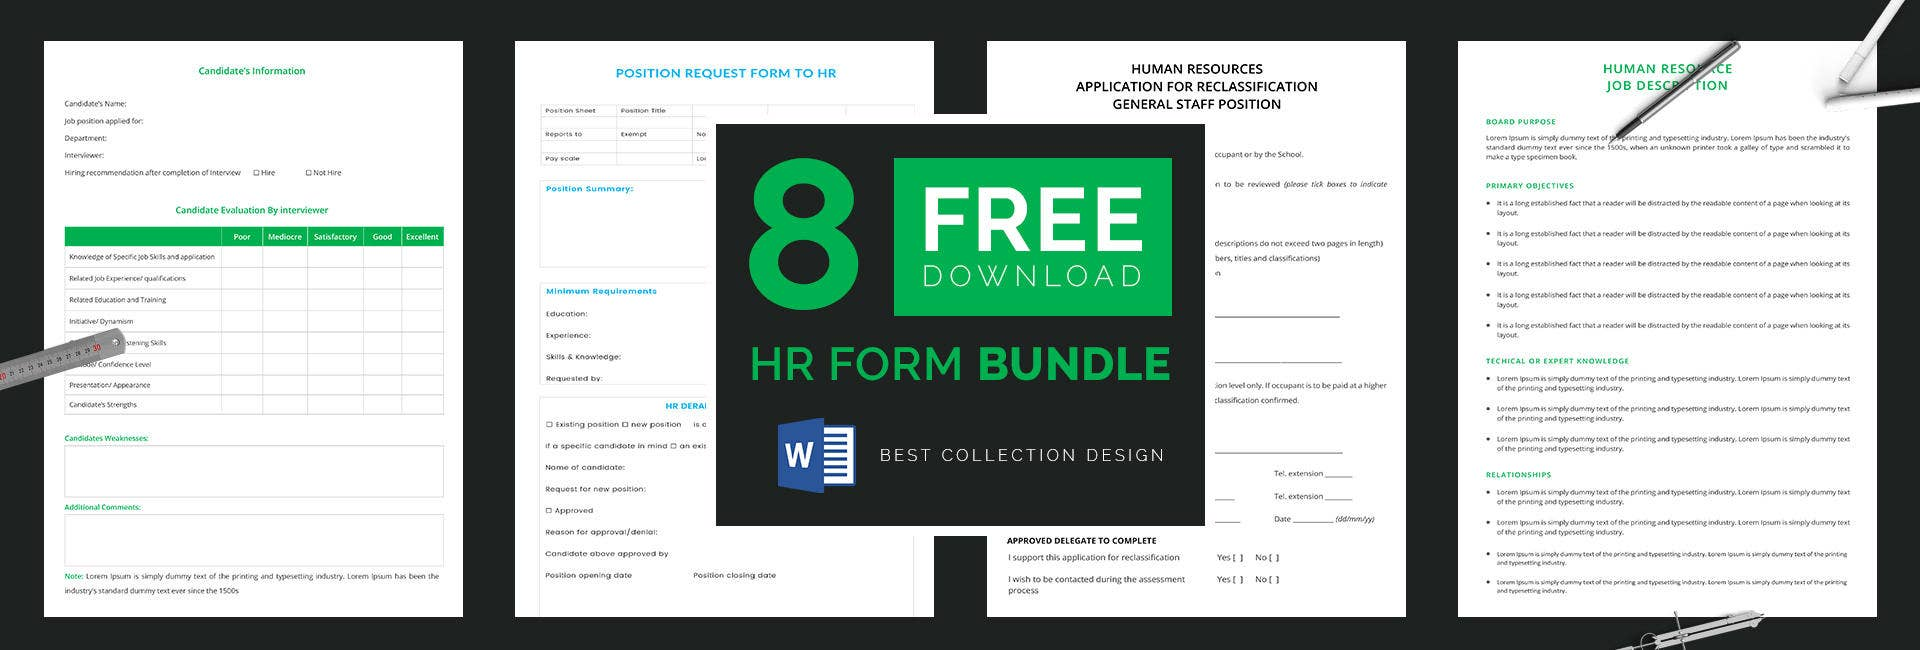 hr_forms_bundle